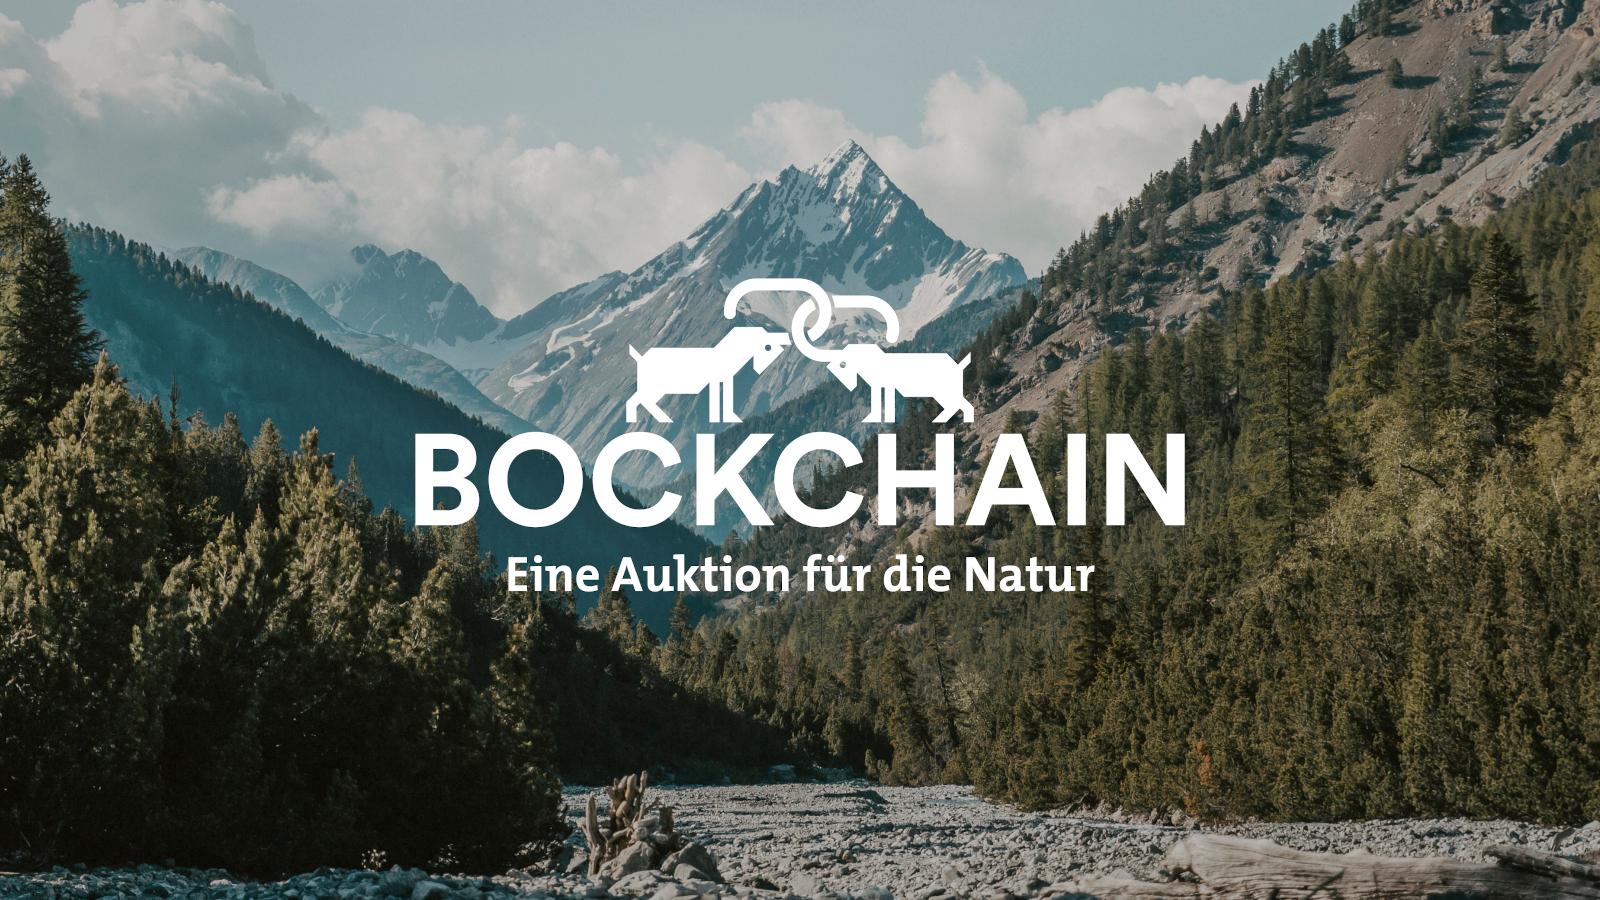 Bockchain: Ein Schweizer Kulturgut neu als NFT